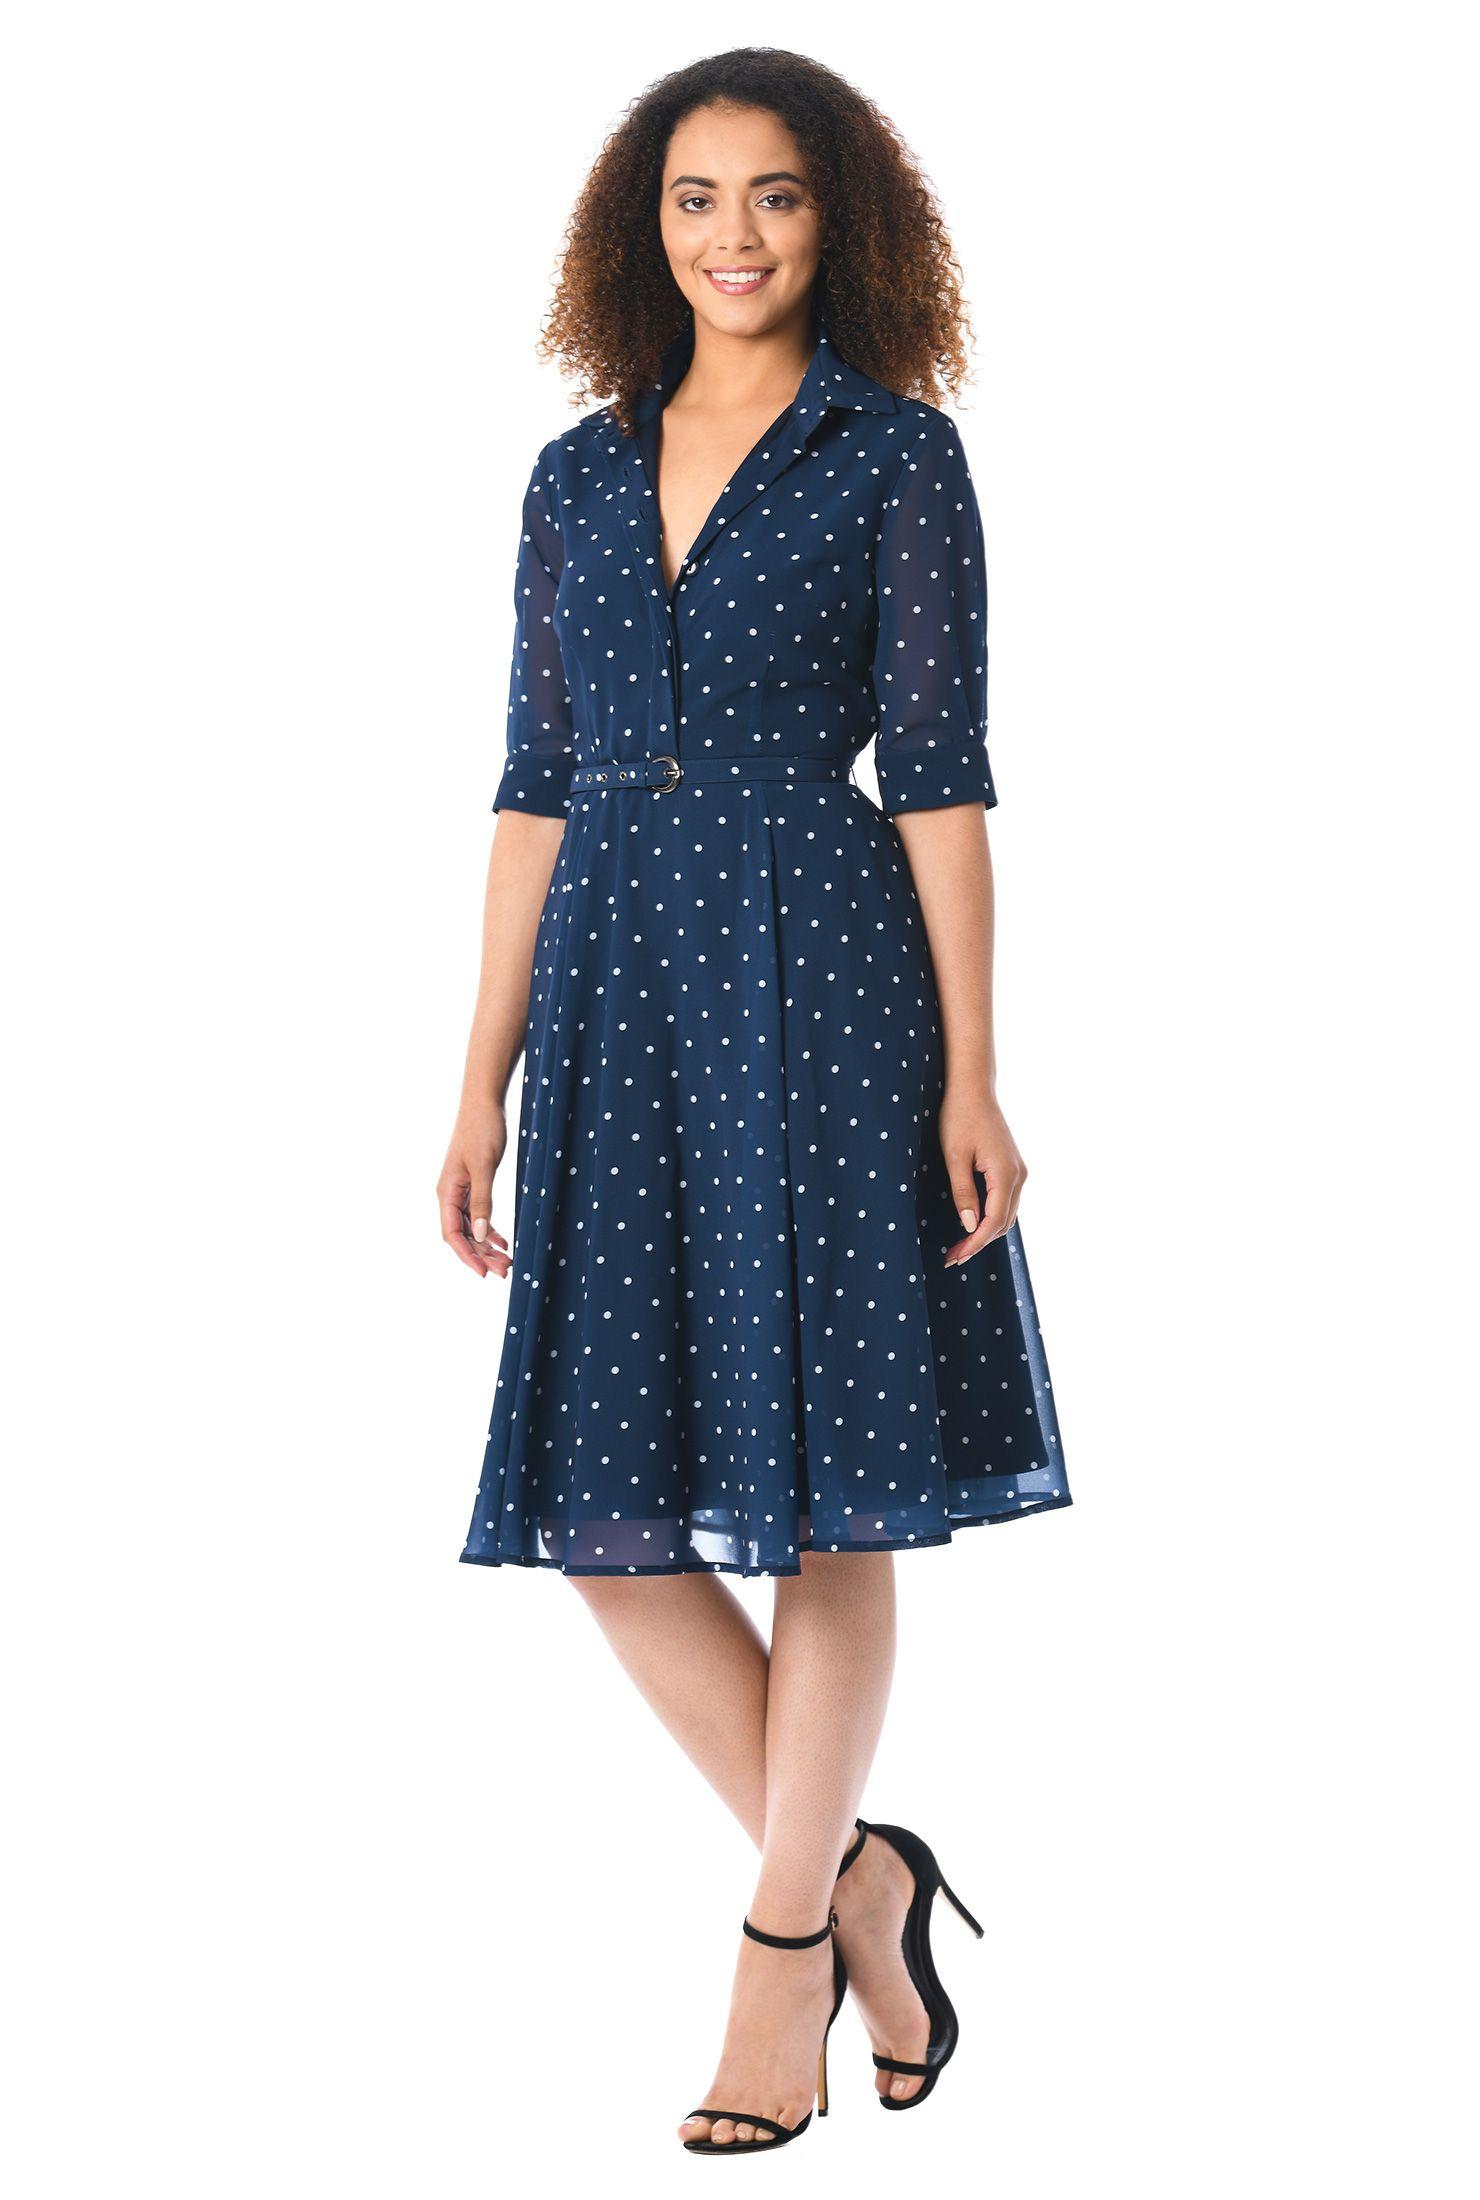 6193fd1e8ff Women's Fashion Clothing 0-36W and Custom   Lil Hardin's Lindy ...